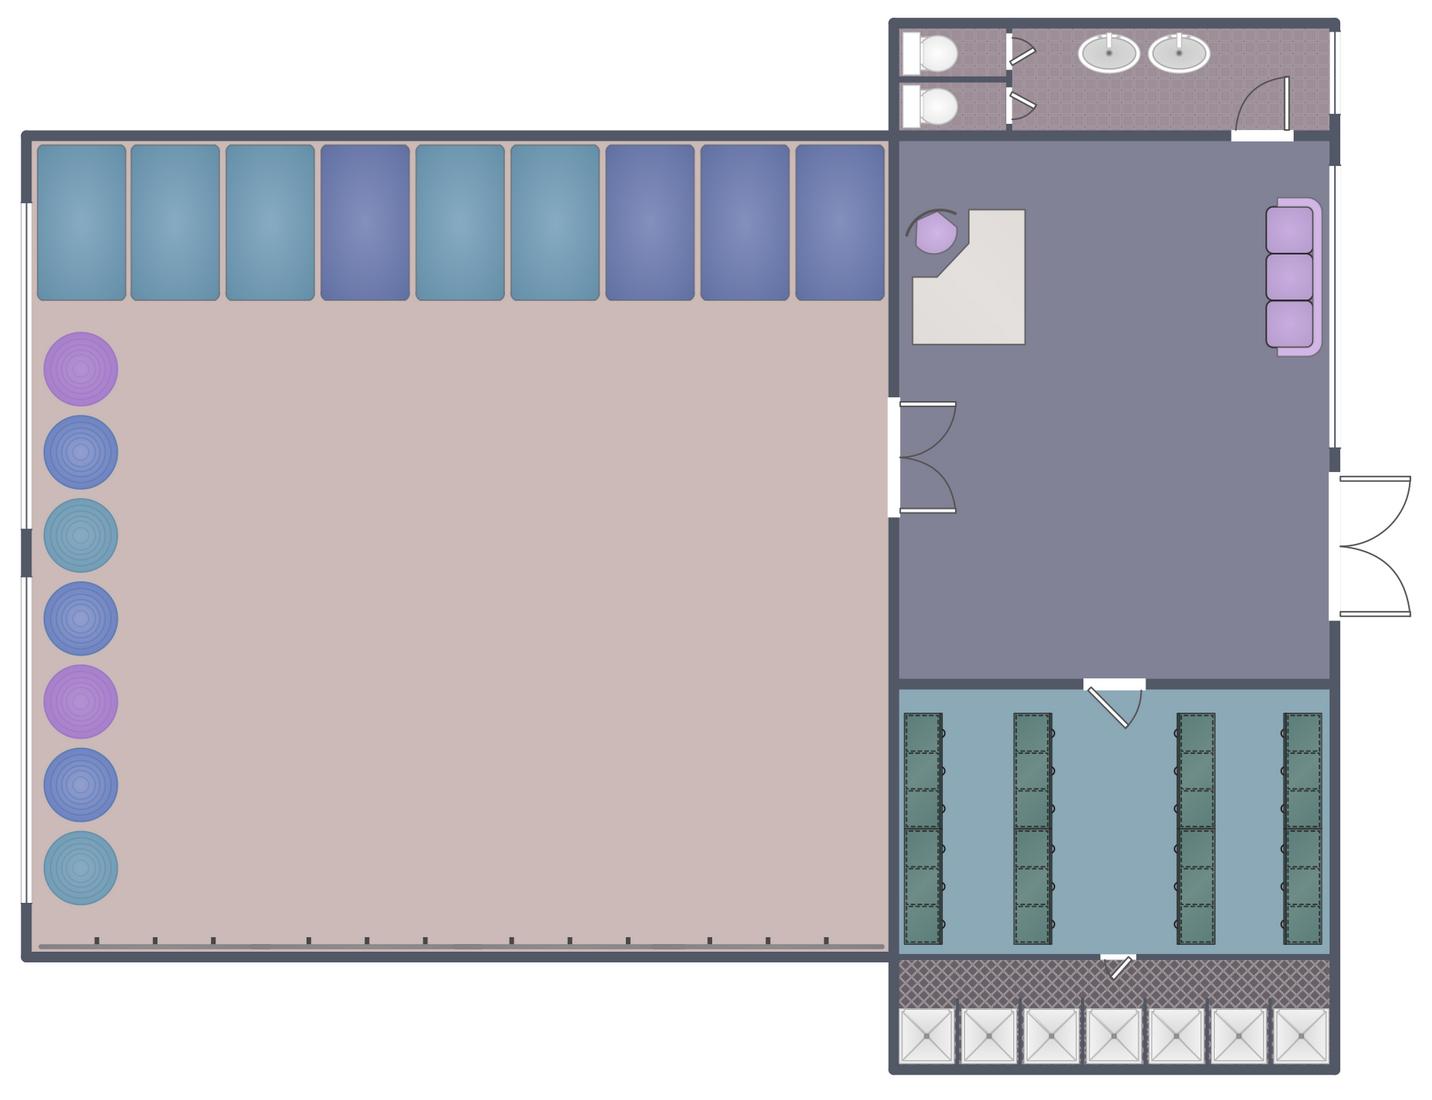 Gym and Spa Area Plans Solution | ConceptDraw.com